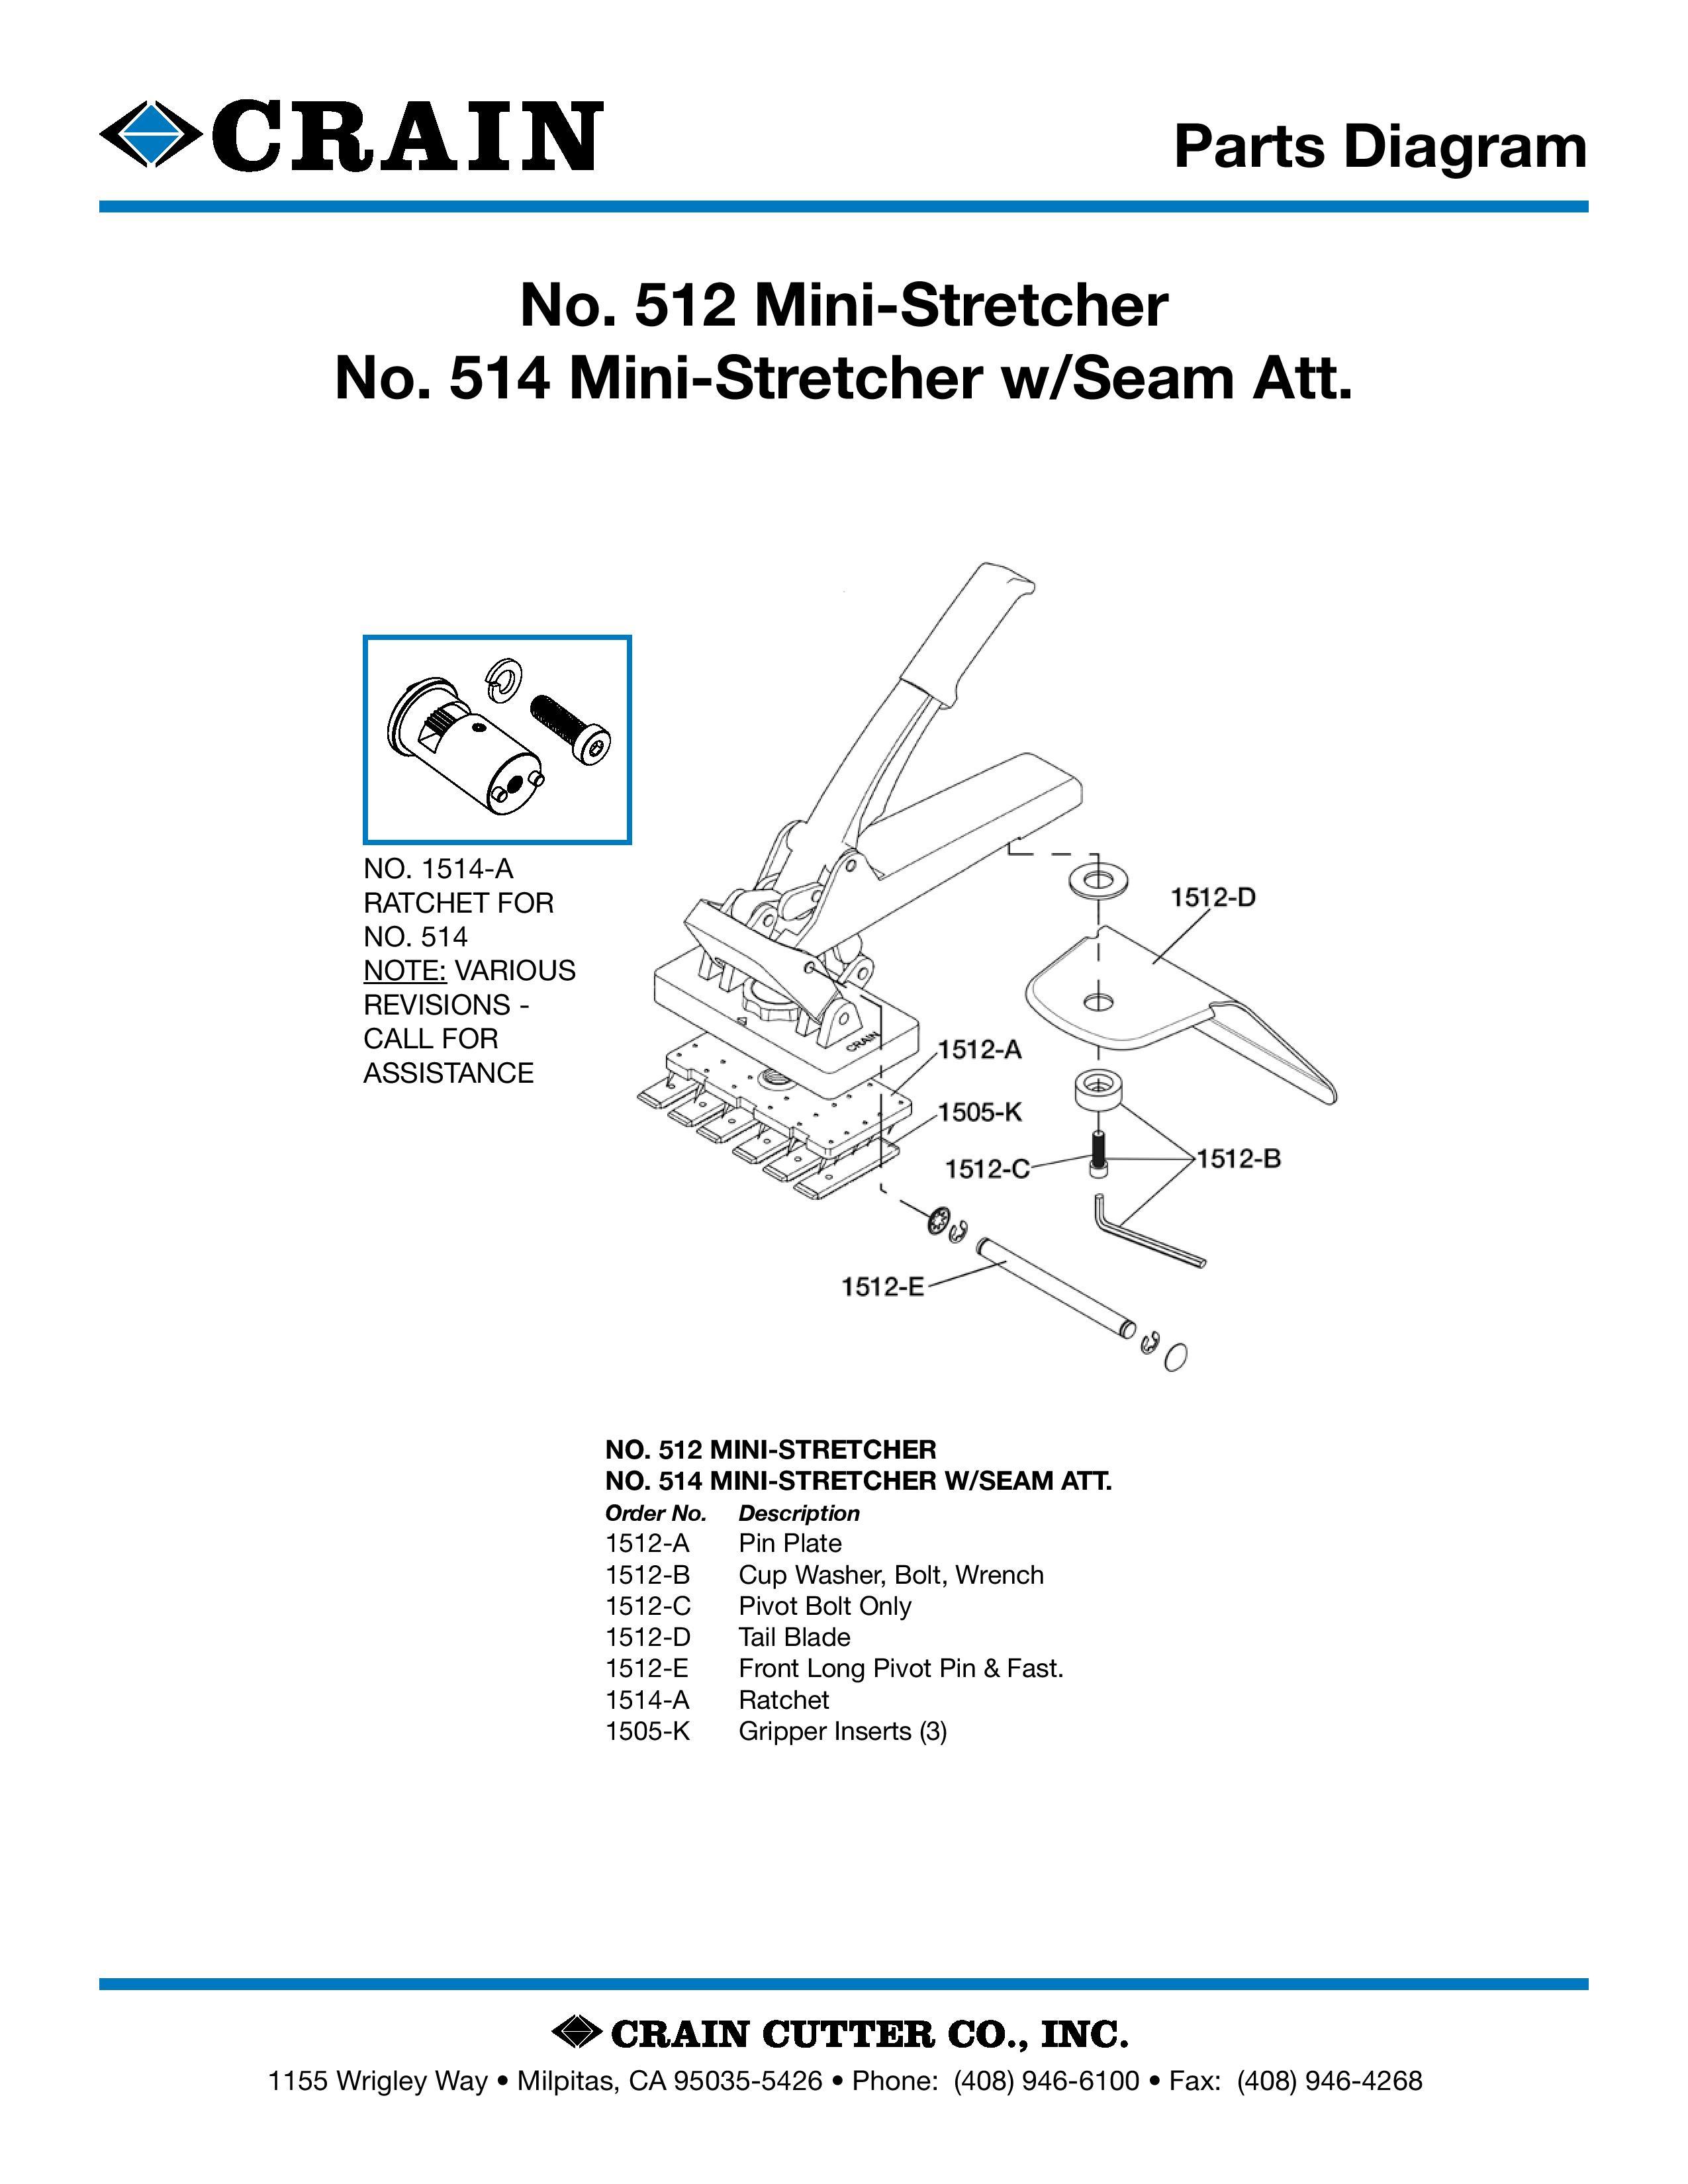 514 Mini-Stretcher